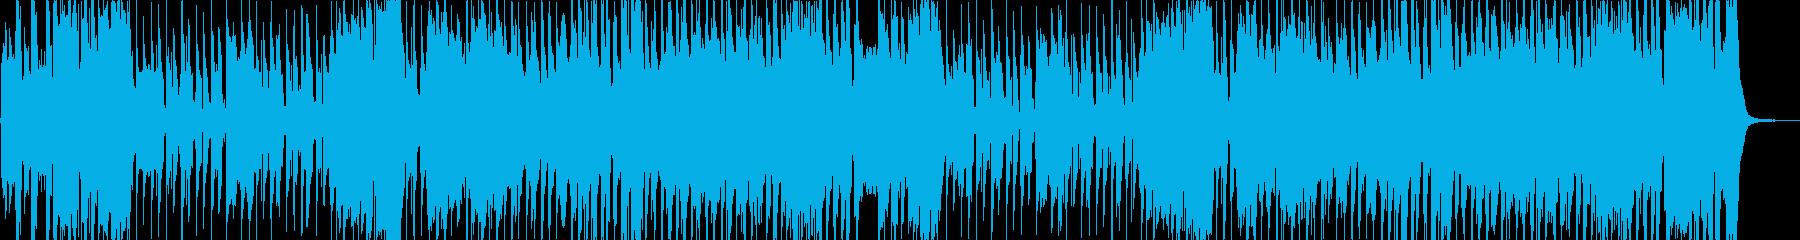 Sunflower -1の再生済みの波形